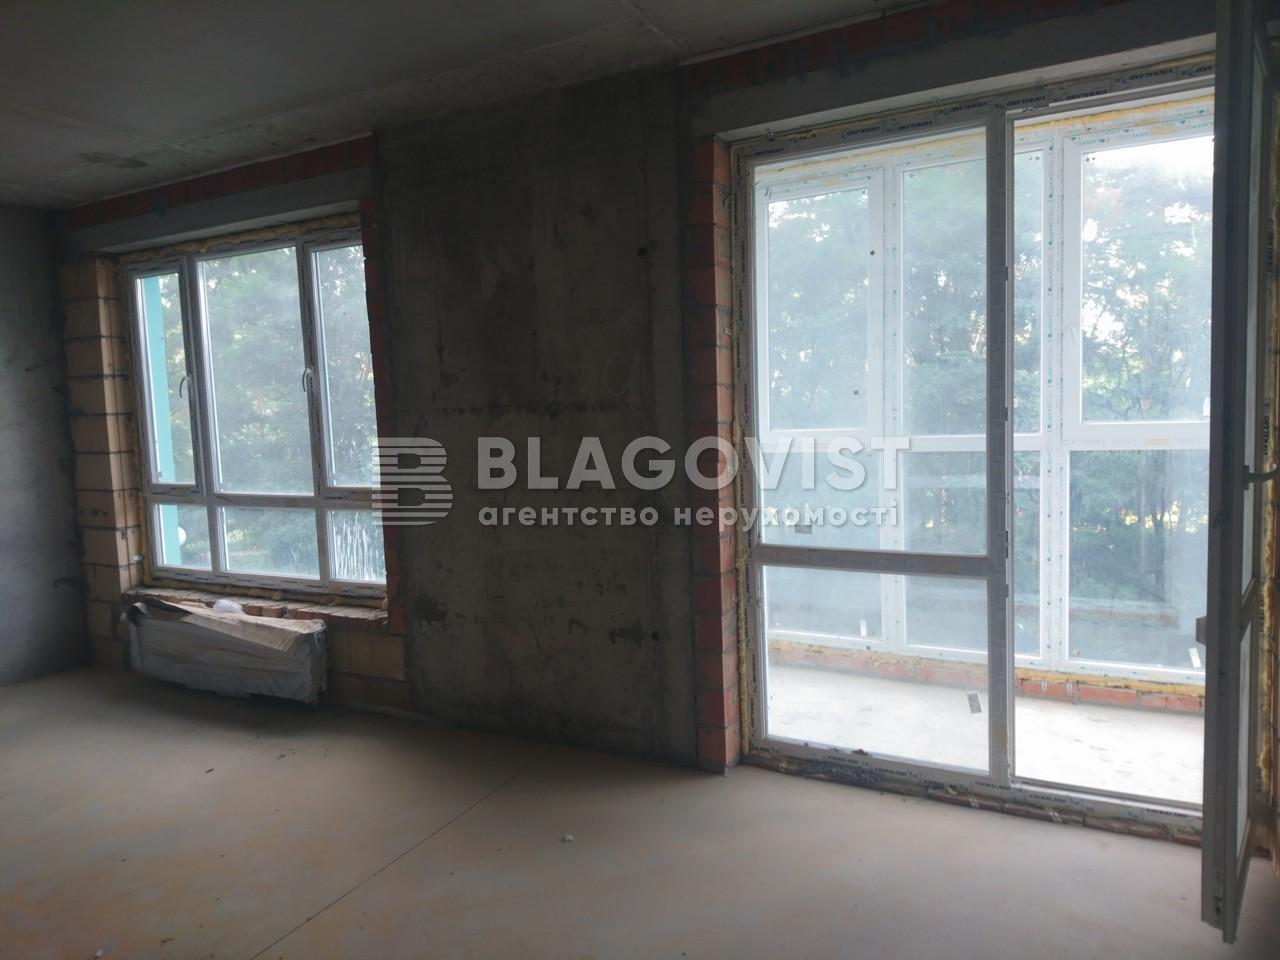 Квартира F-41861, Воскресенская, 18, Киев - Фото 7